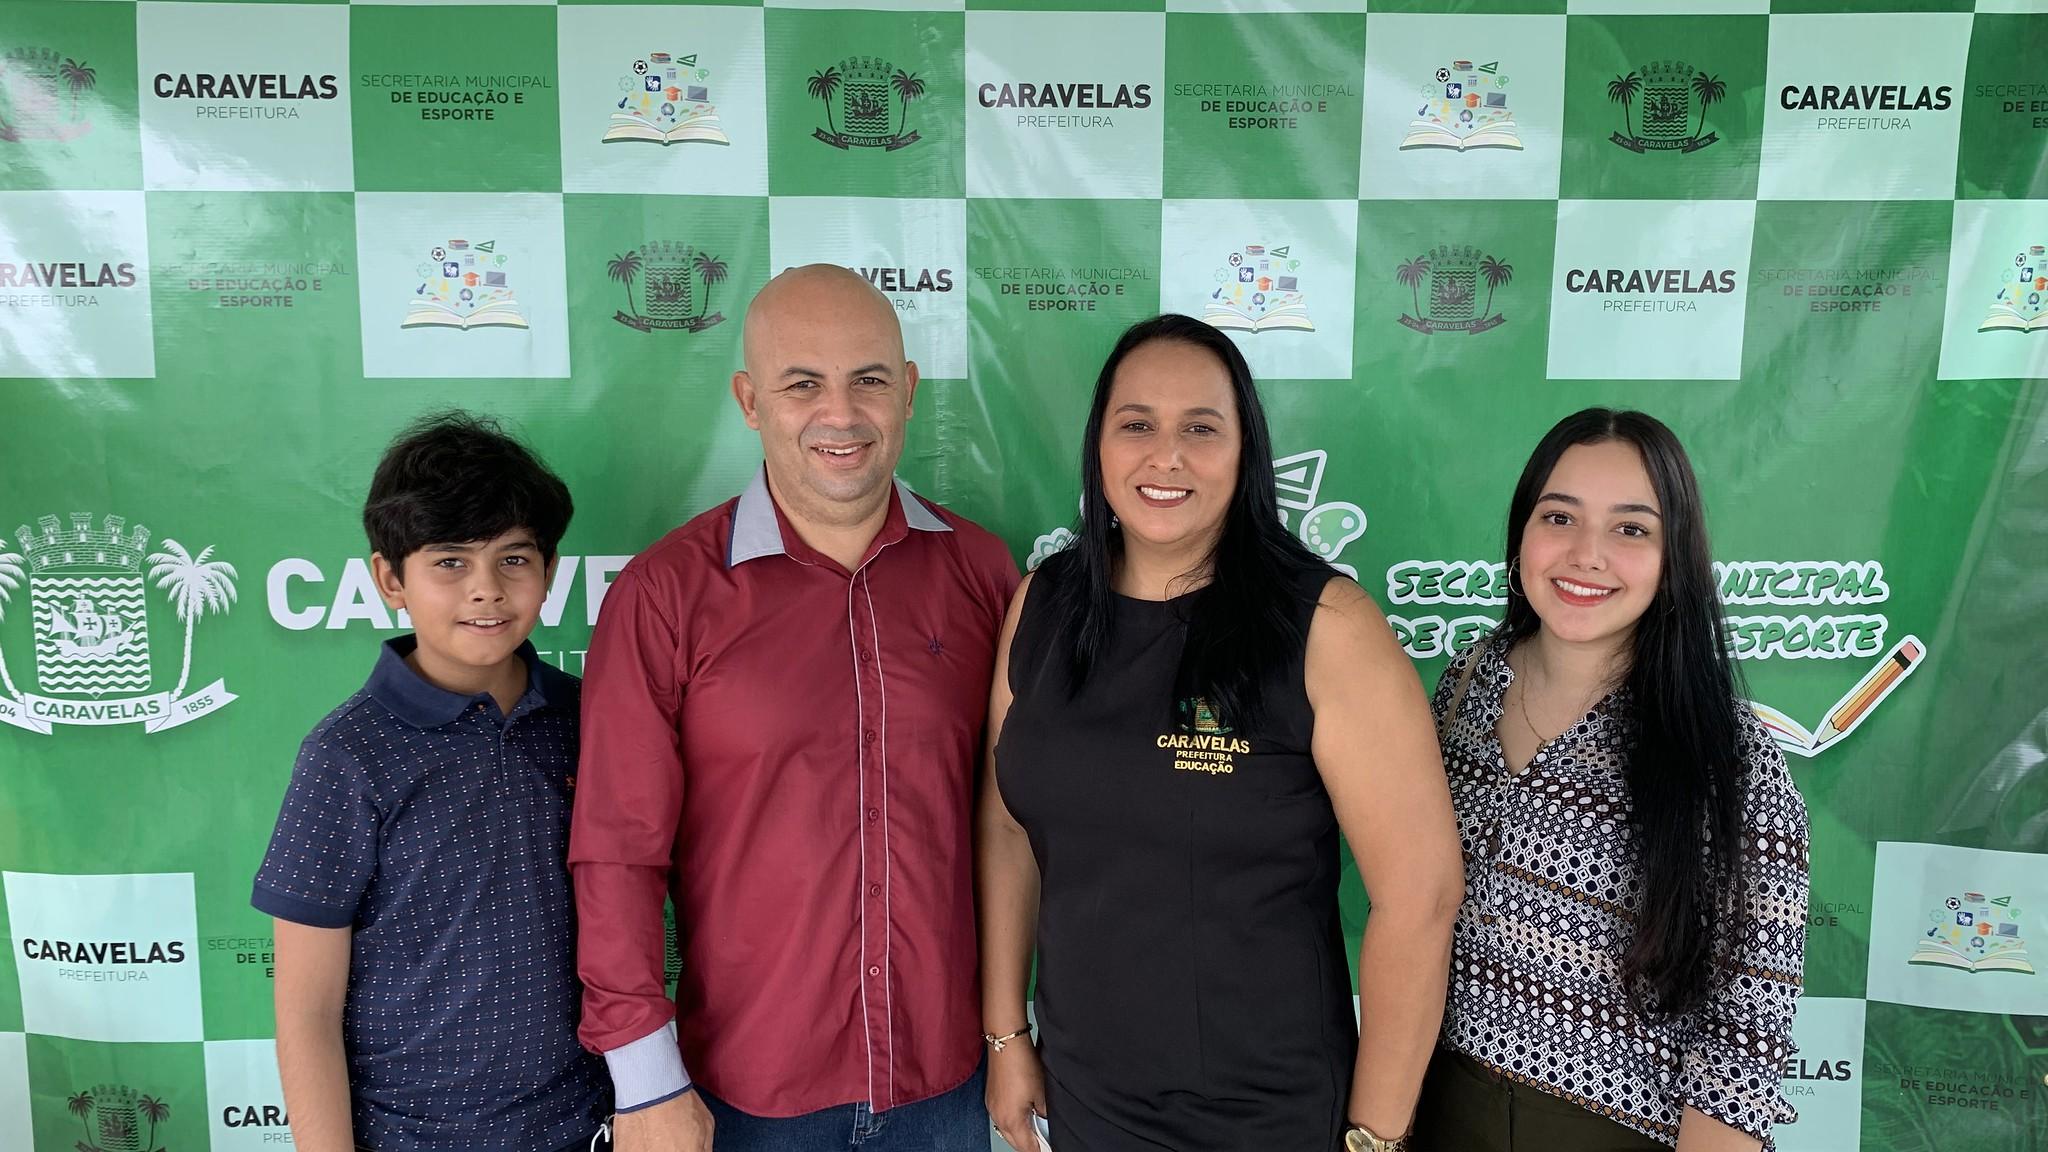 Jocivânia Caetano e família